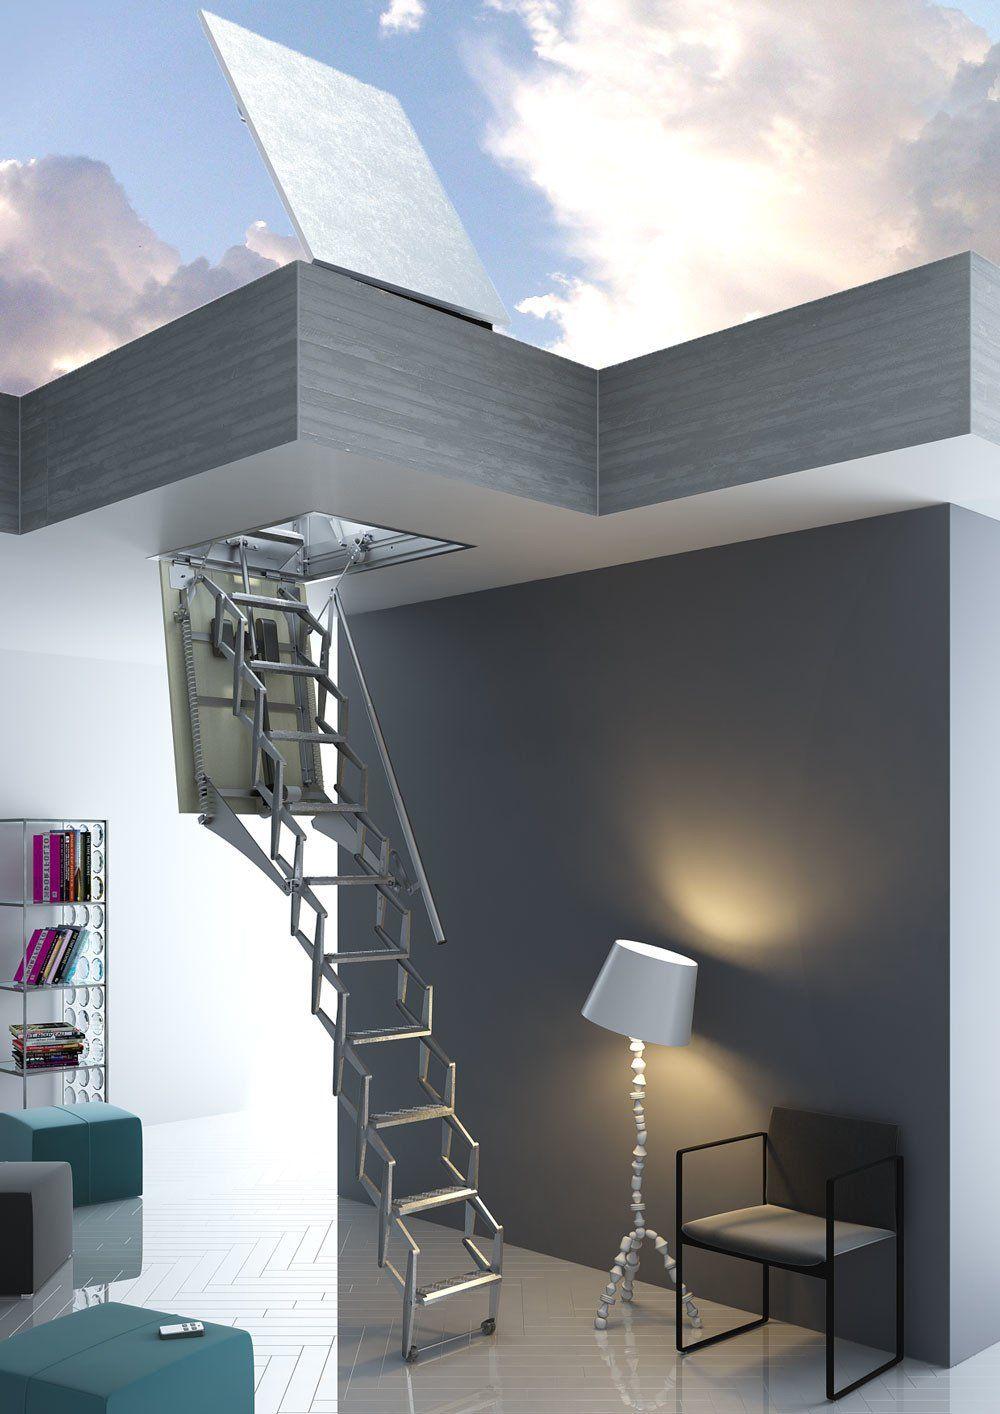 Concertina Loft Ladders Doors And Windows In 2019 Roof